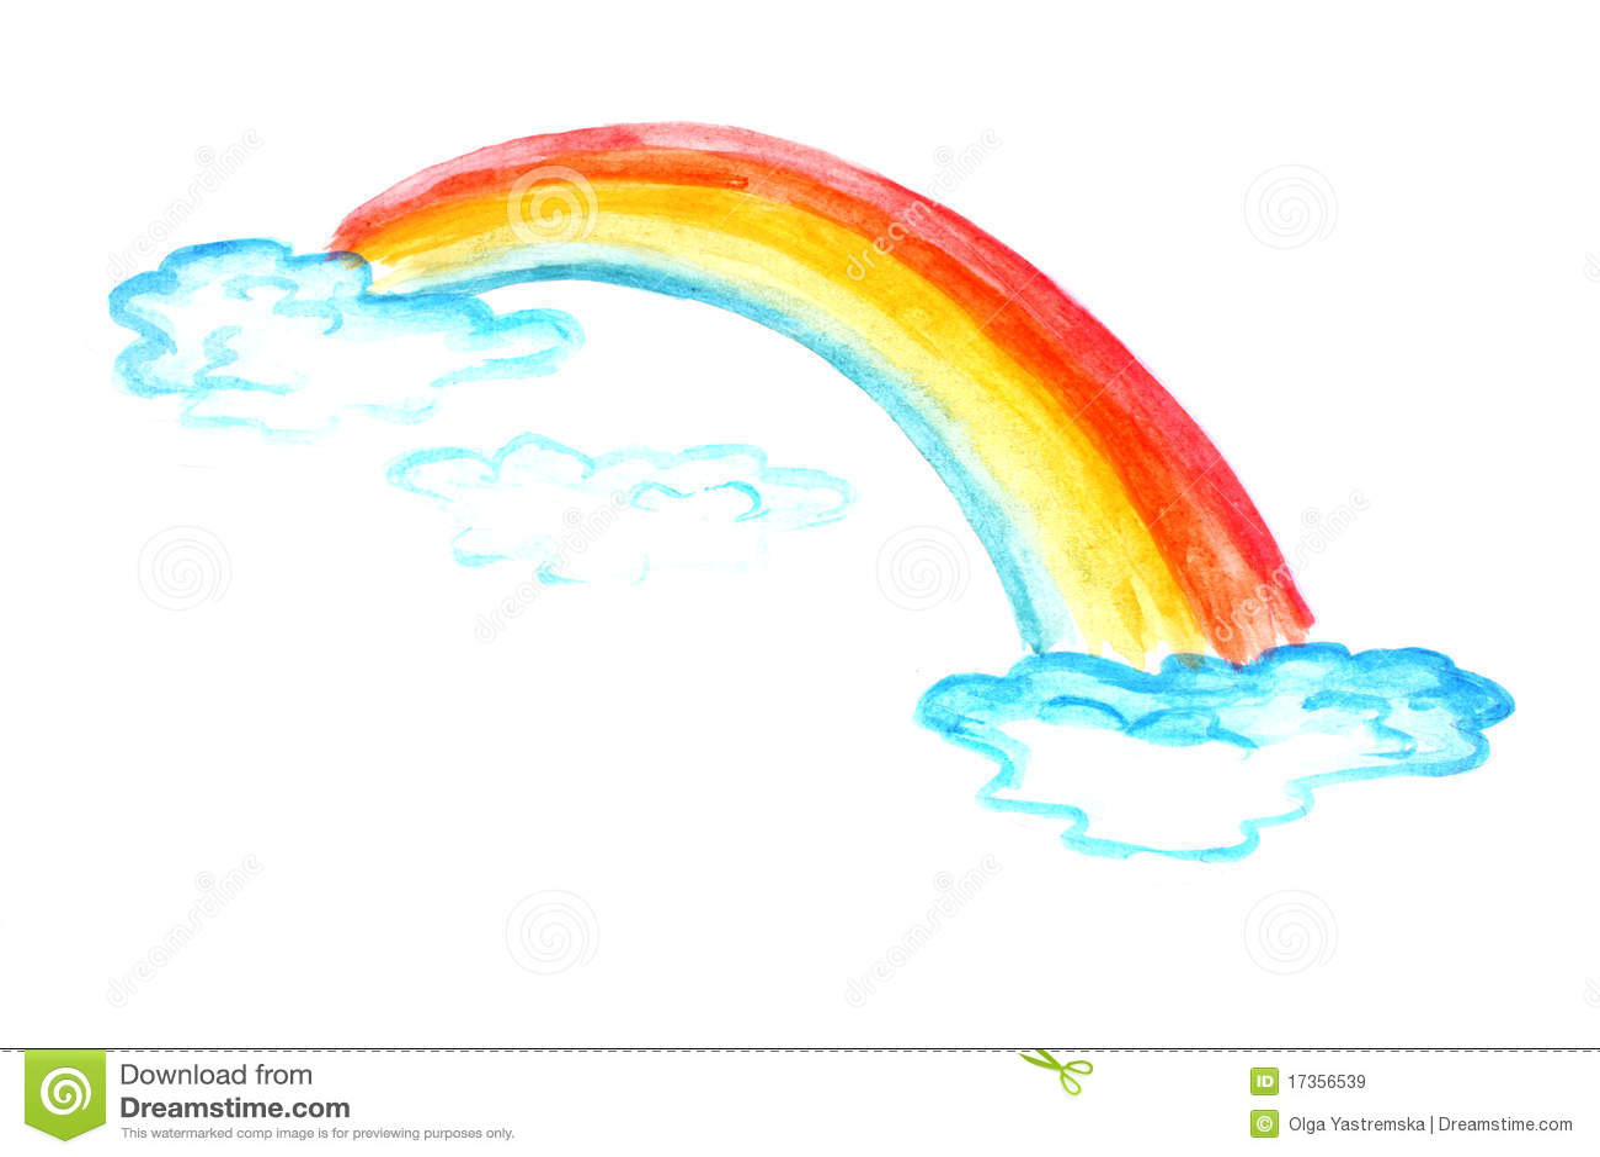 Dessin d 39 enfants d 39 un arc en ciel image stock image du - Dessin arc en ciel ...